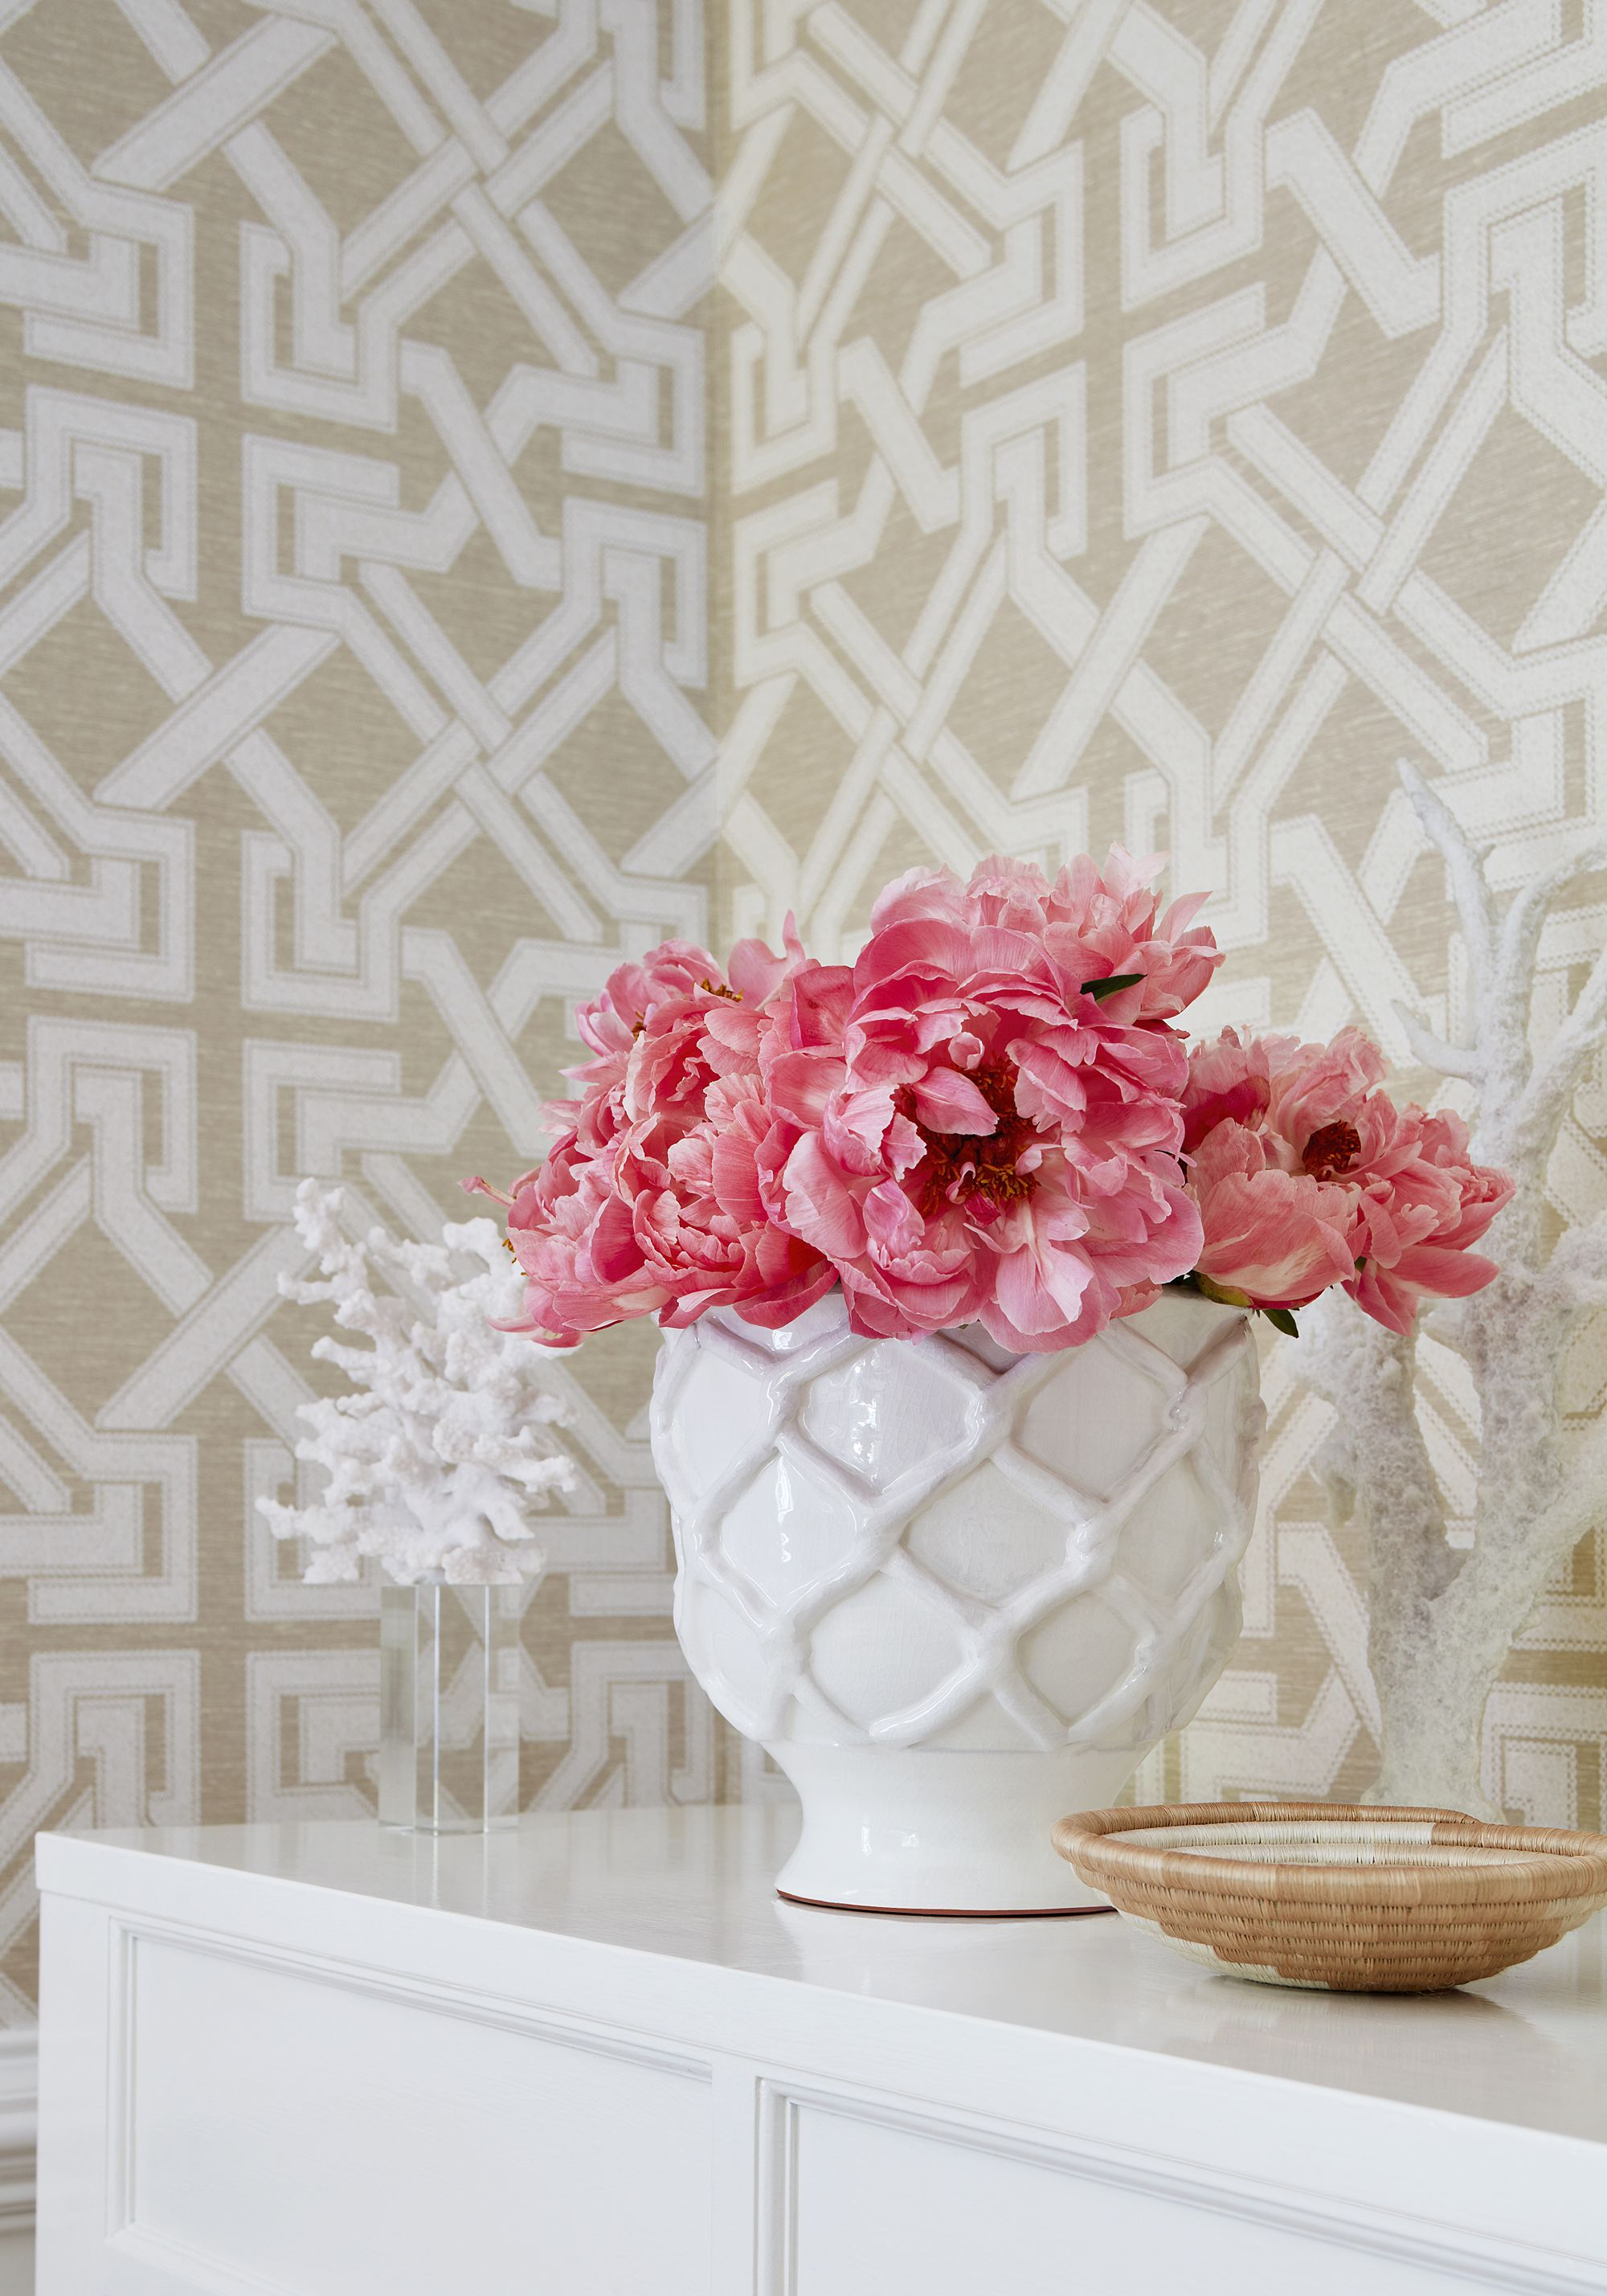 Thibaut Thibaut, Thibaut wallpaper, Grey and gold wallpaper